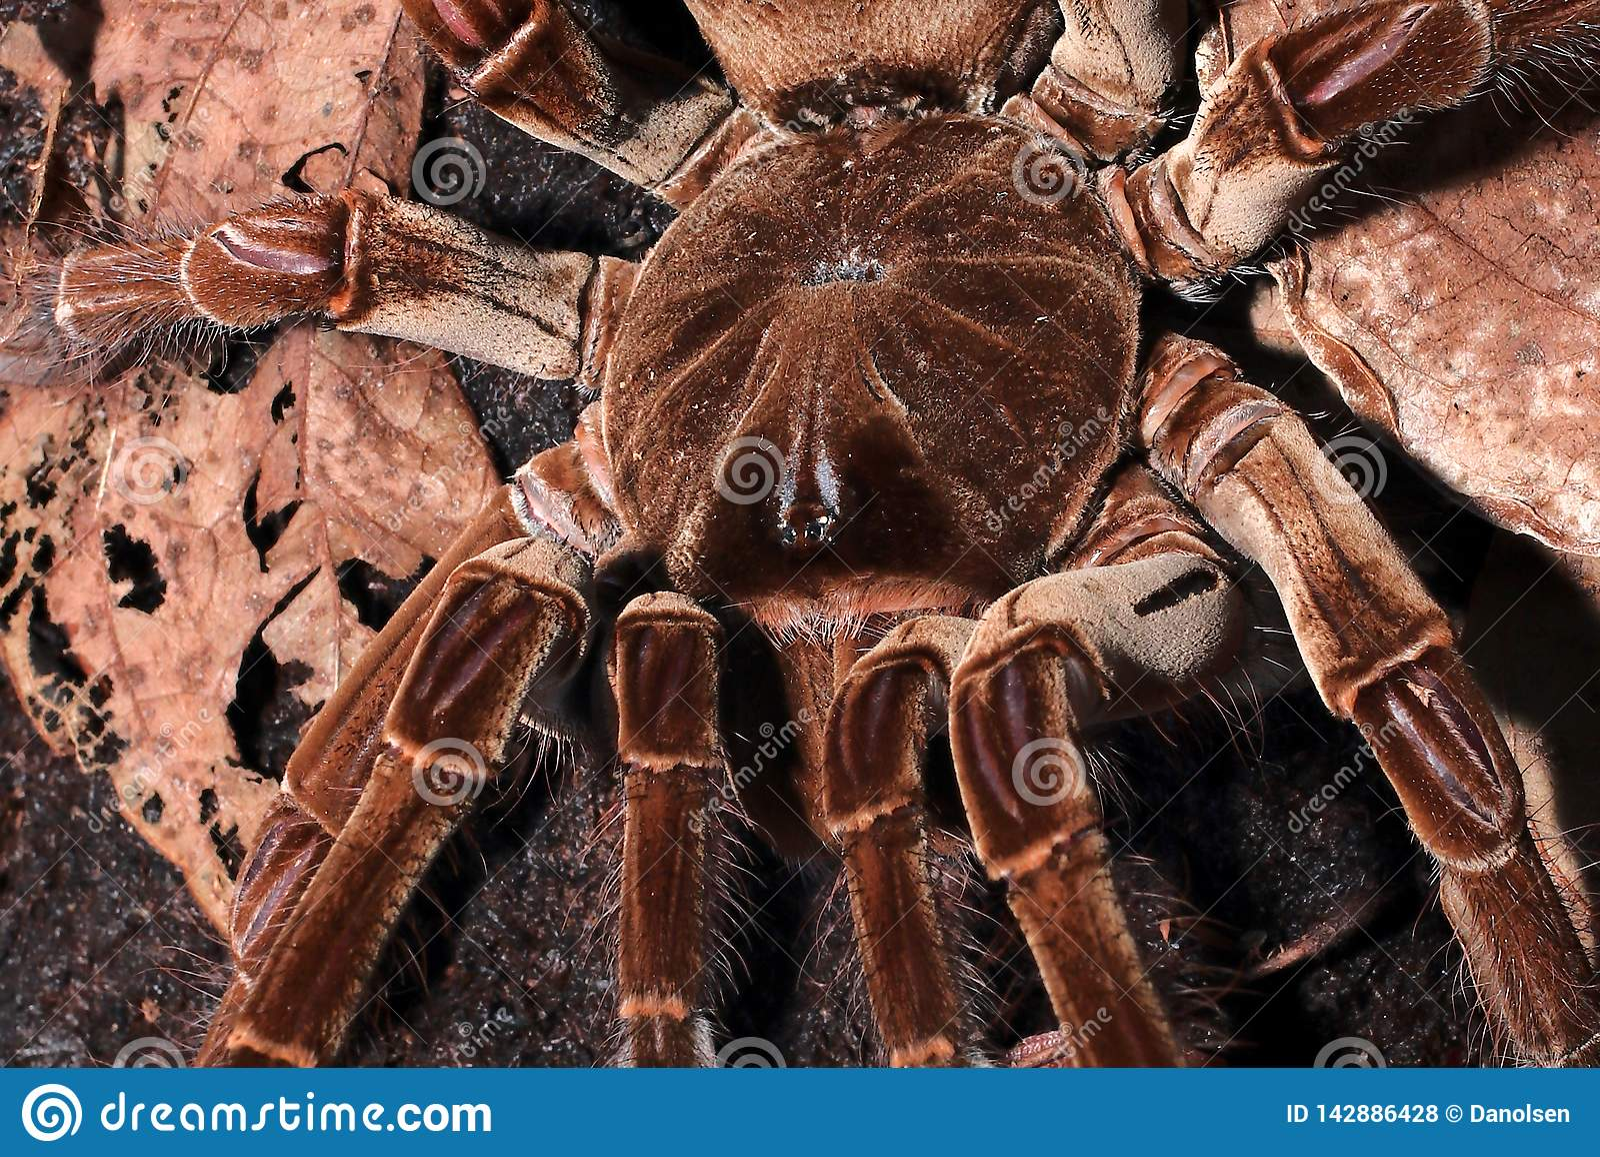 World Biggest Spider Species Stock Photo Image Of Goliath